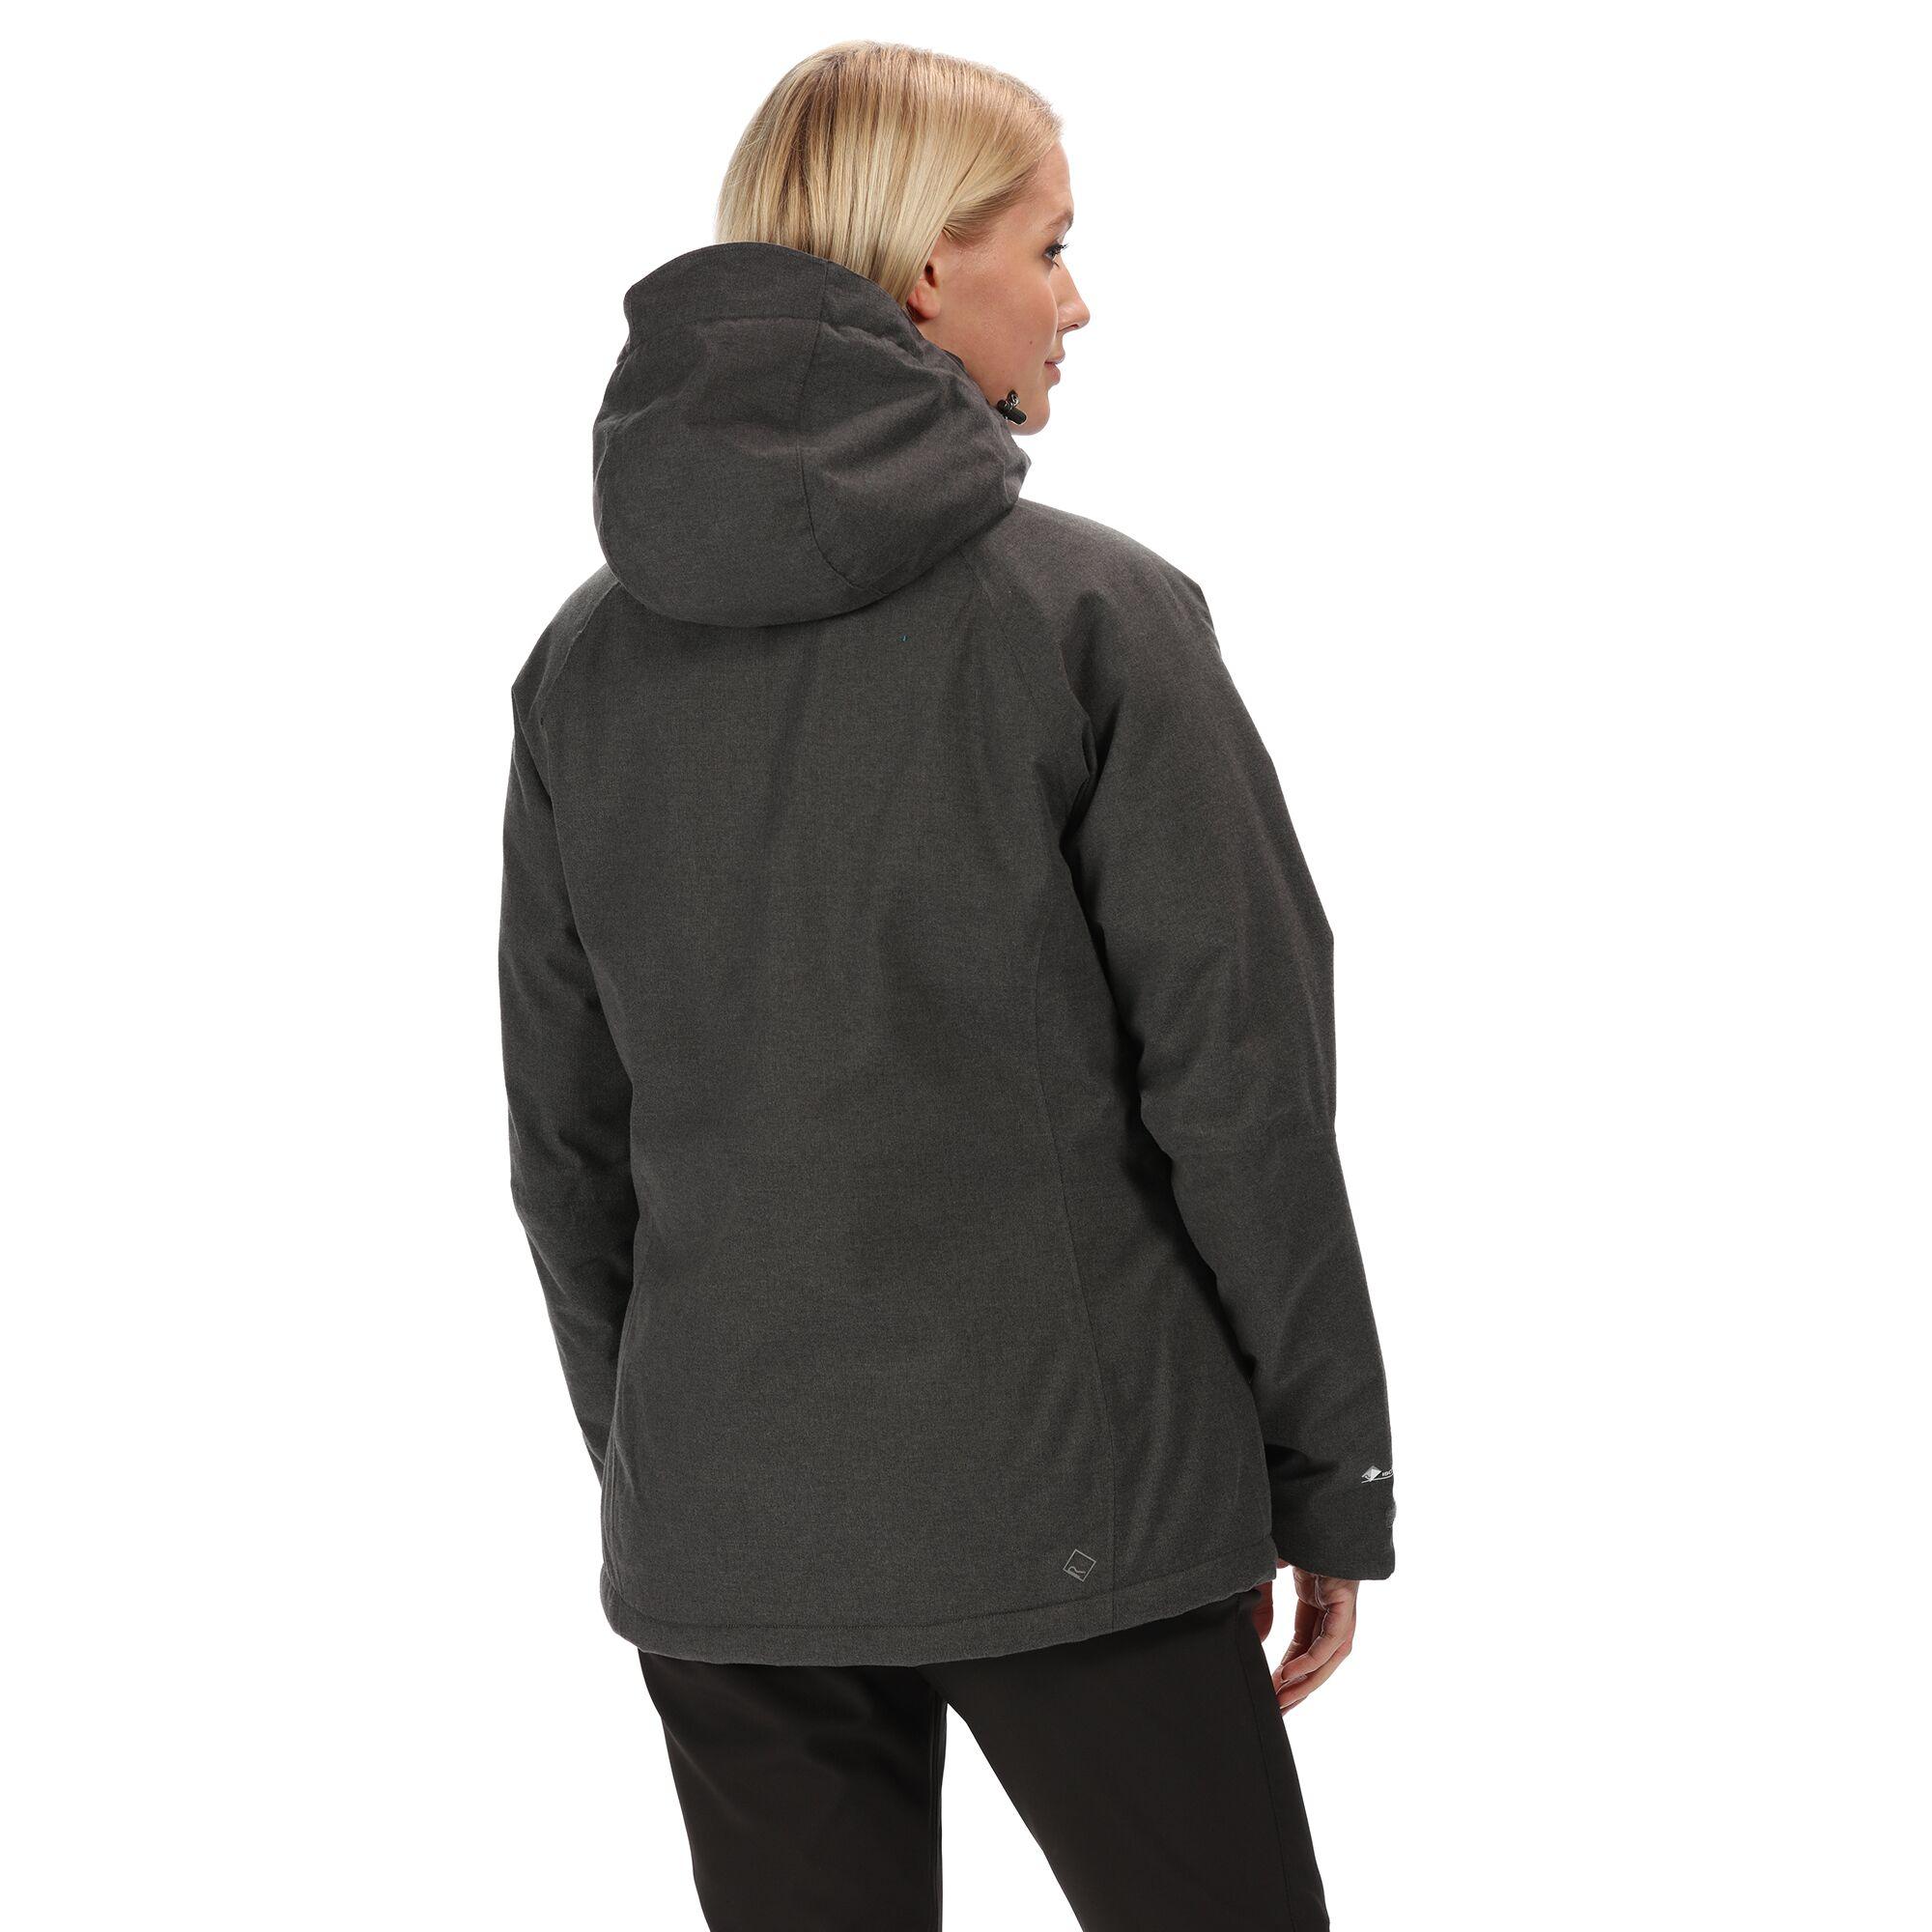 Mujer Regatta Highside III Waterproof and Breathable Insulated Chaqueta